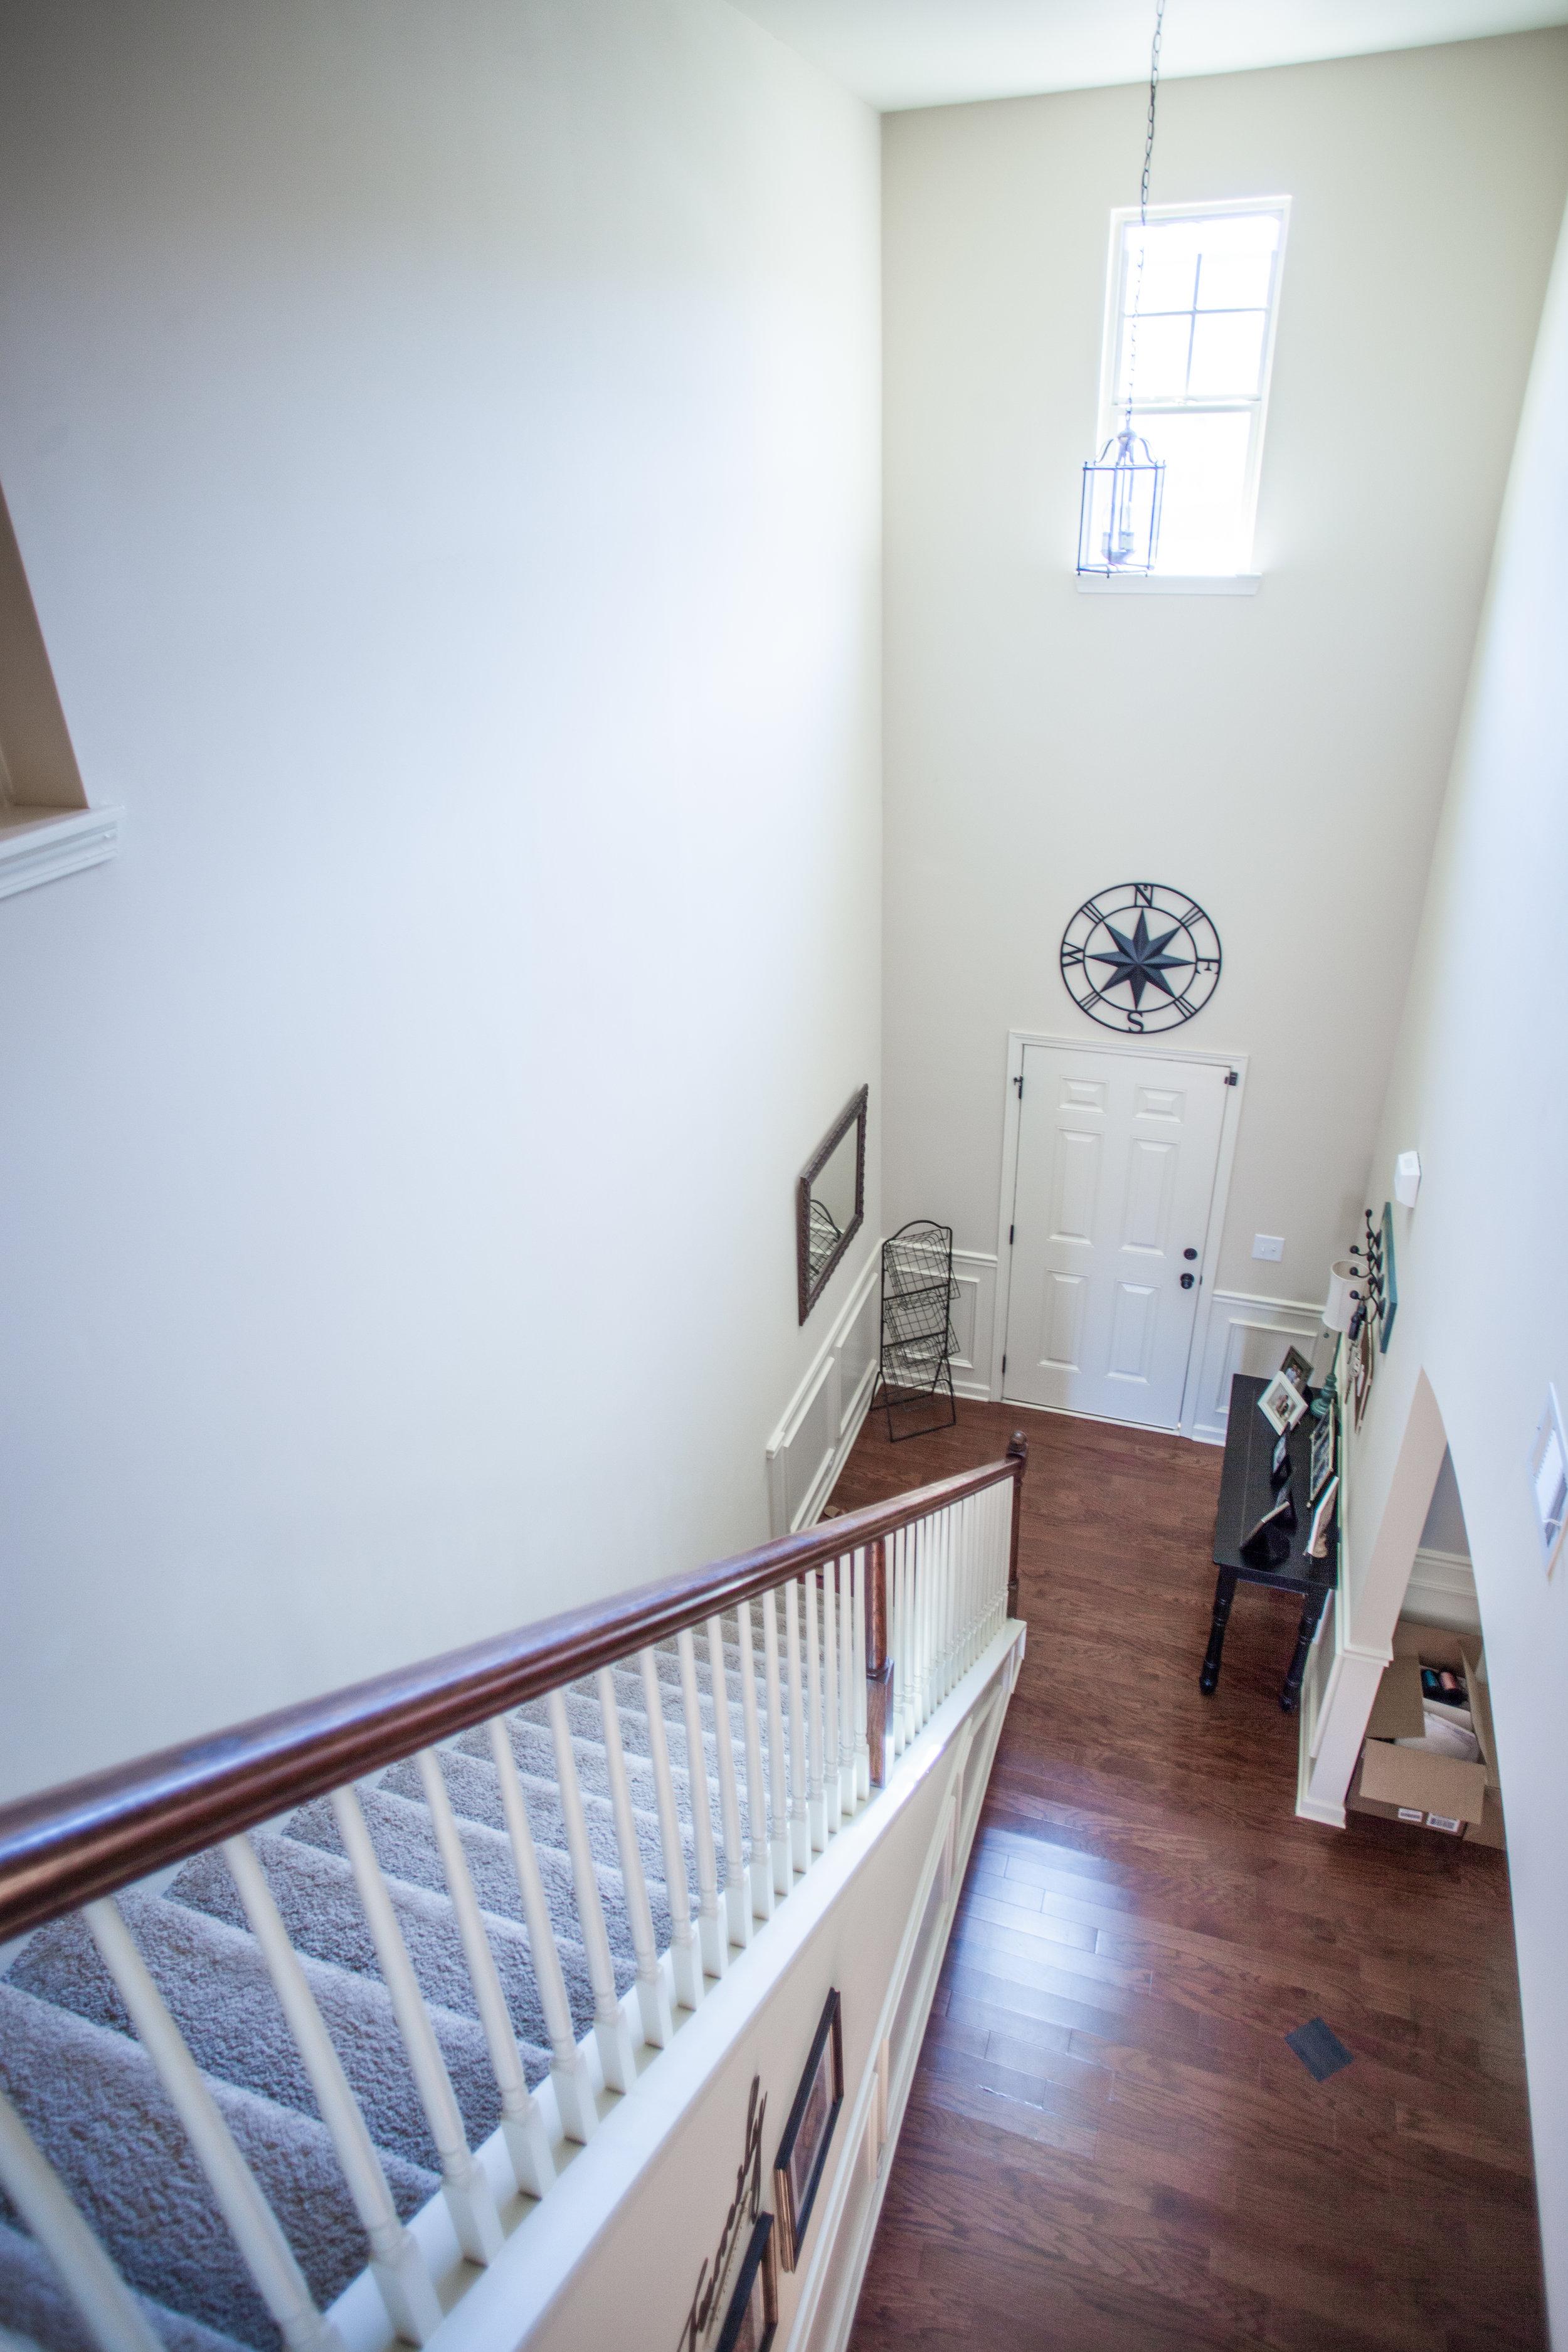 woodstock-ga-house-for-sale-wingard-real-estate-under-300k-15.jpg